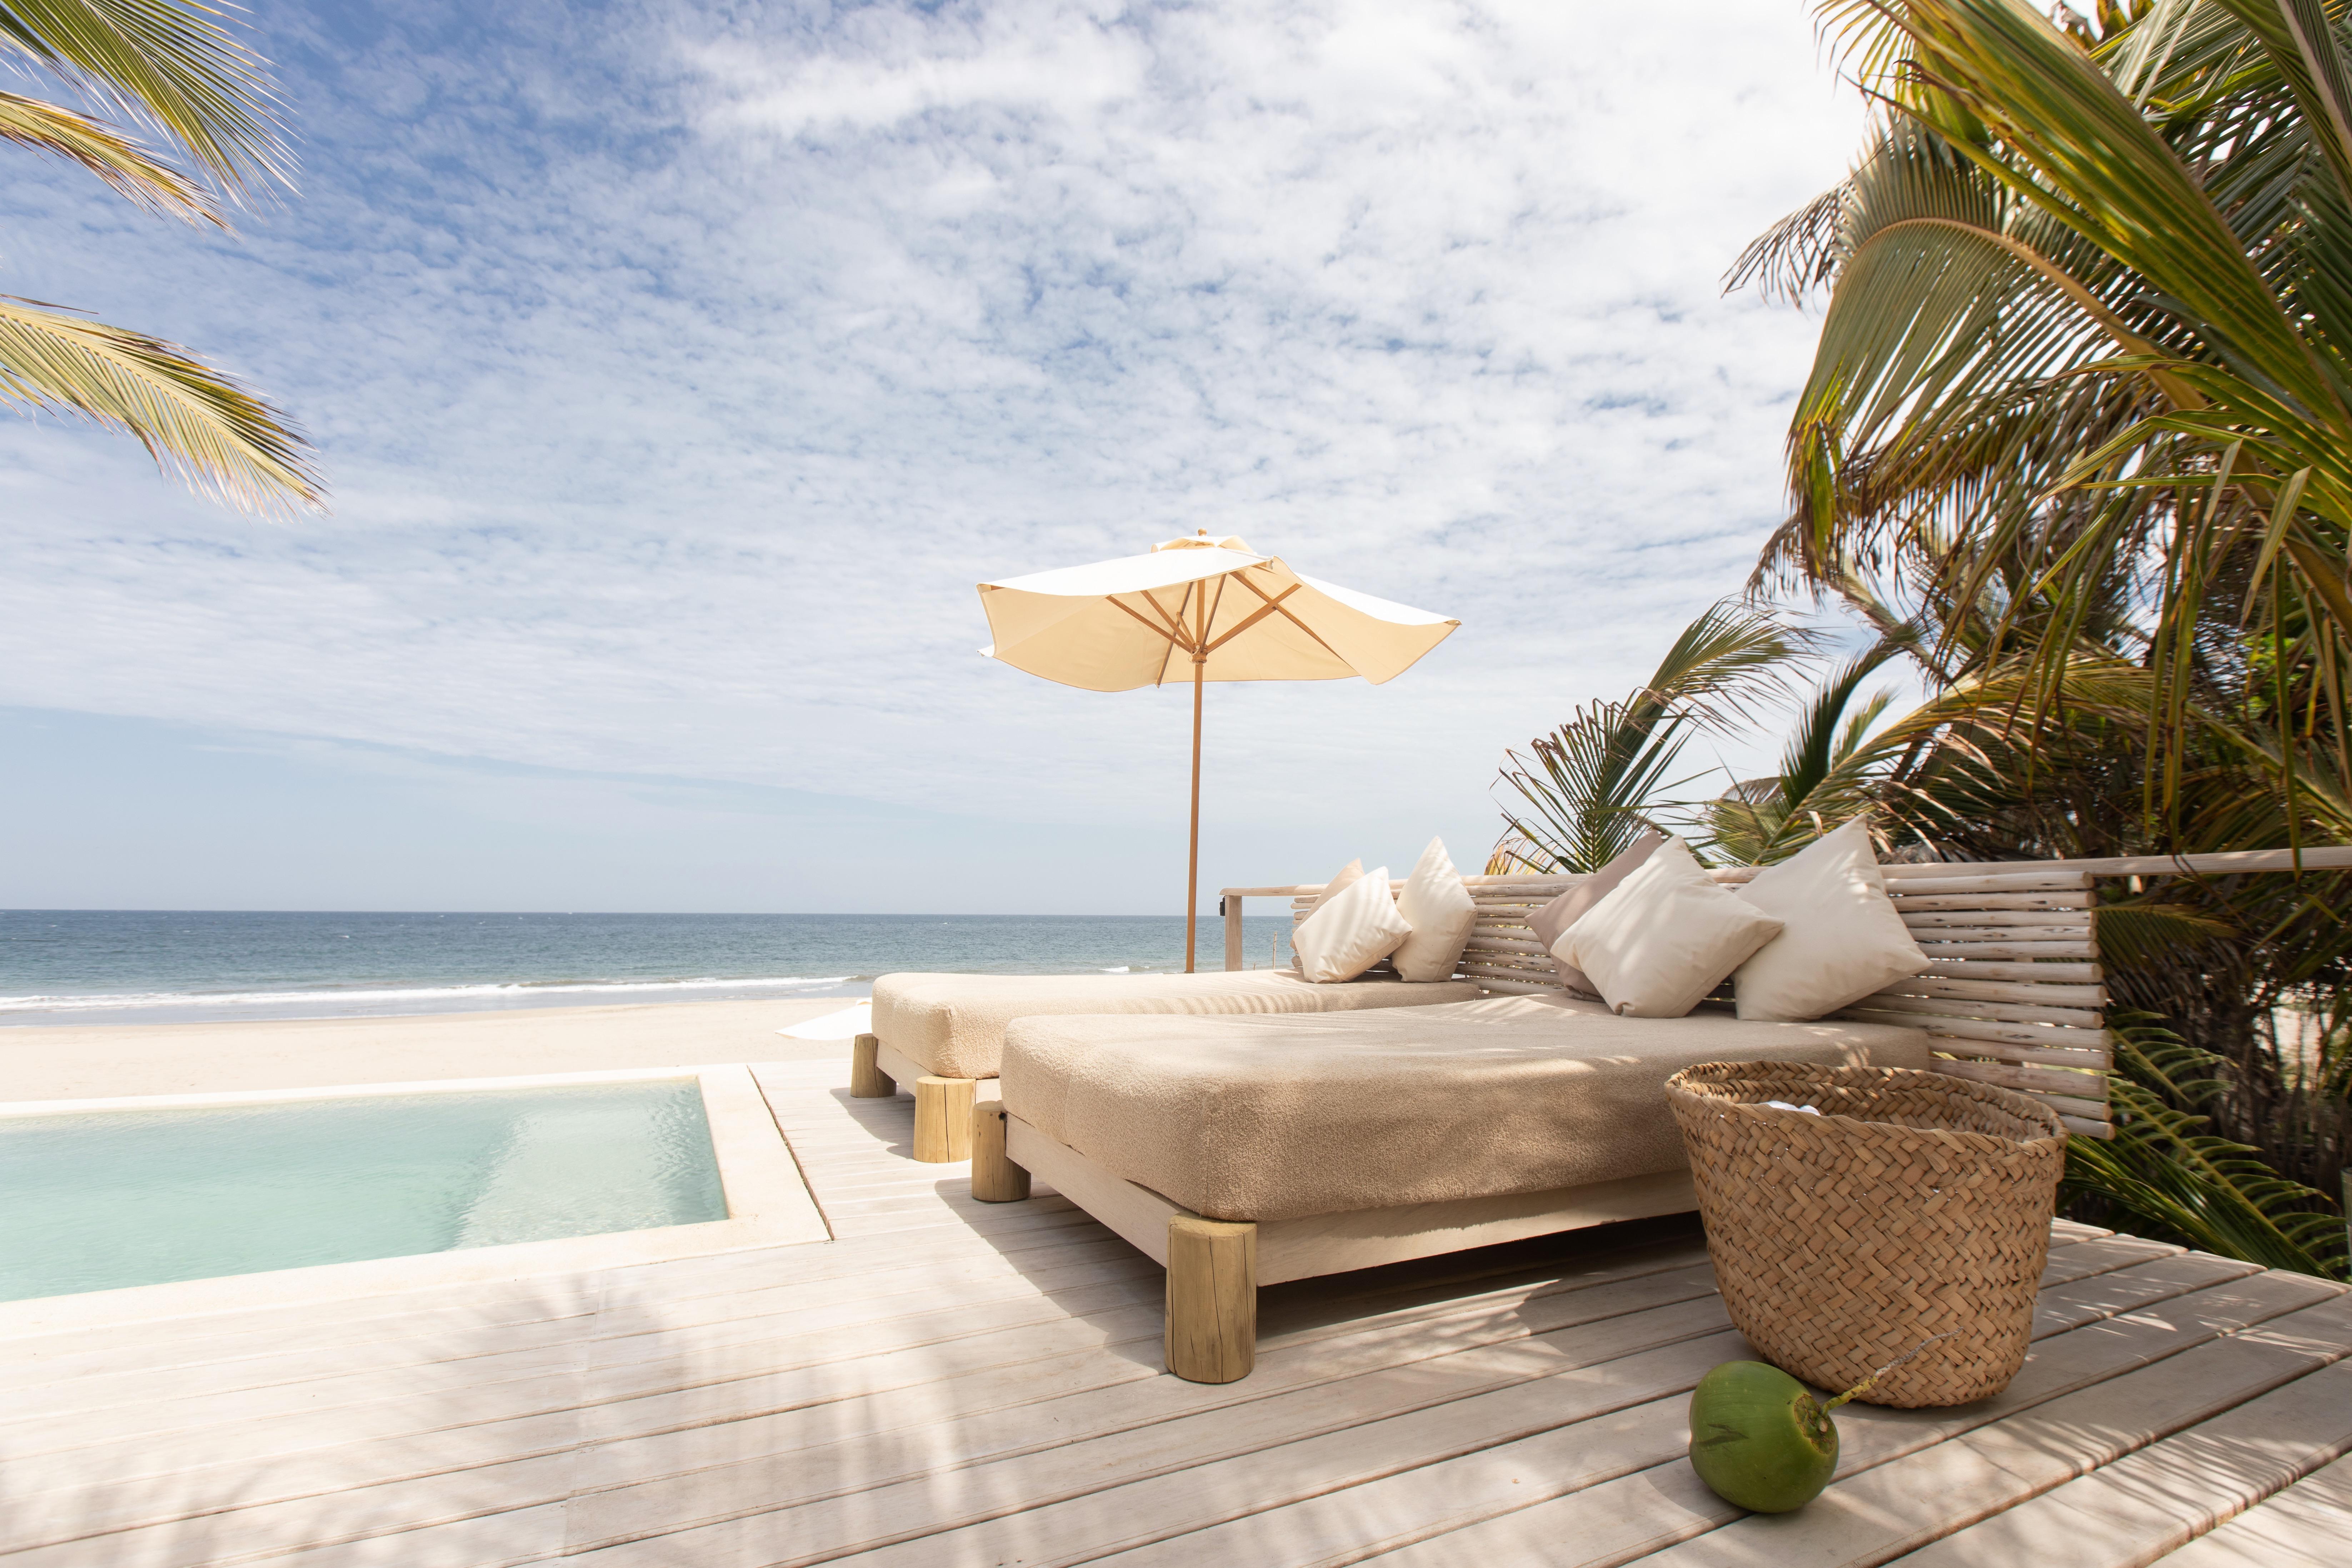 The Best Beach Houses On Peru S North Coast Aracari Travel